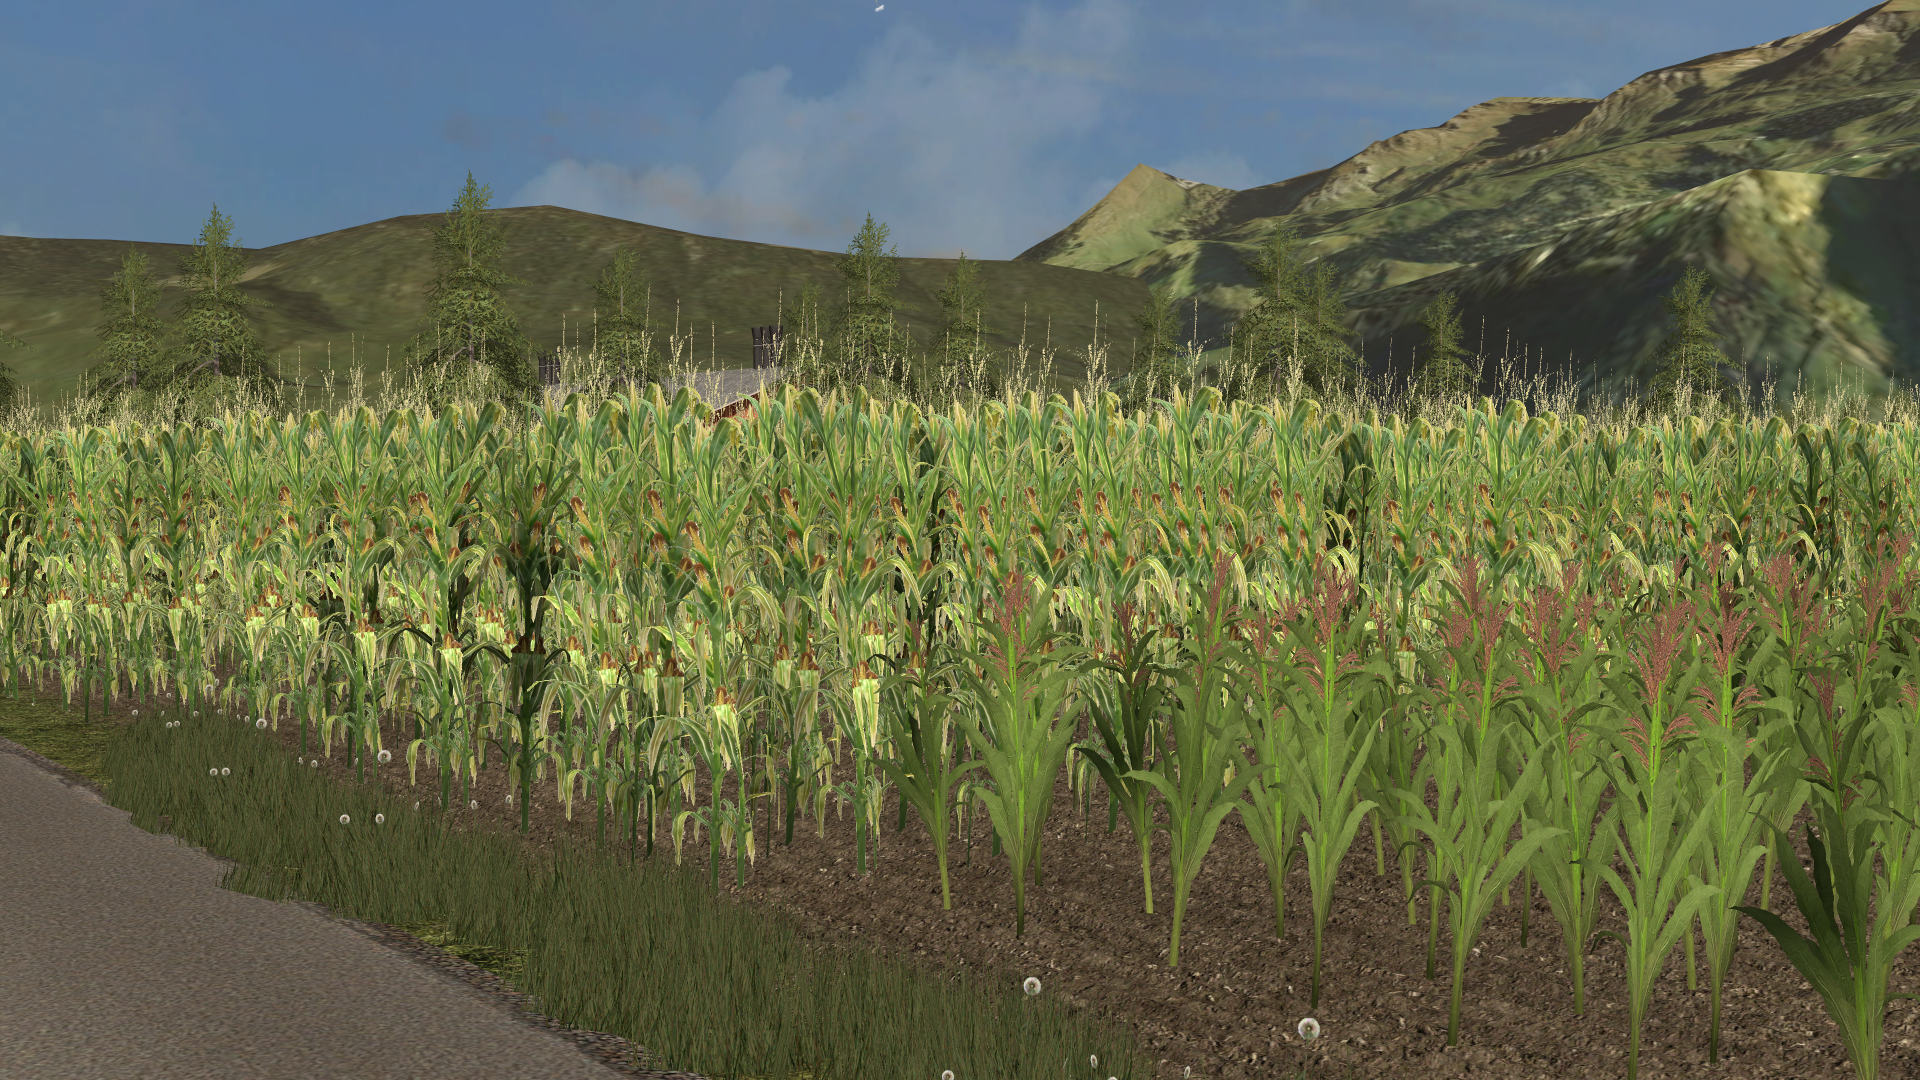 Maize / Corn Texture - Farming simulator 2017 / 17 LS mod